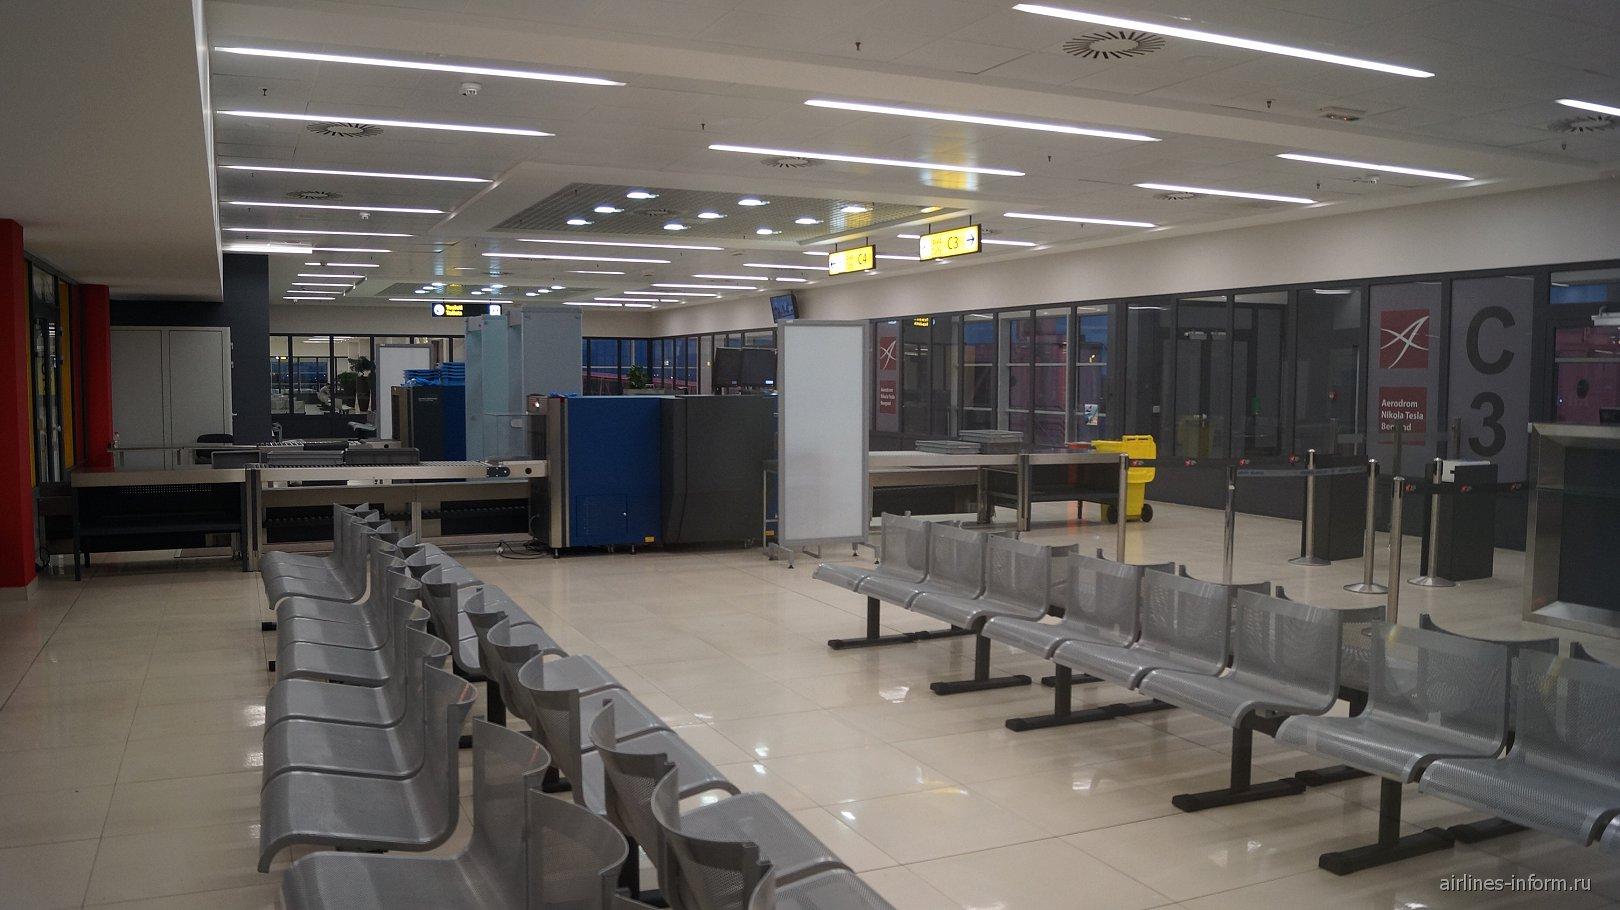 Накопитель перед выходом на посадку в терминале 2 аэропорта Белград Никола Тесла